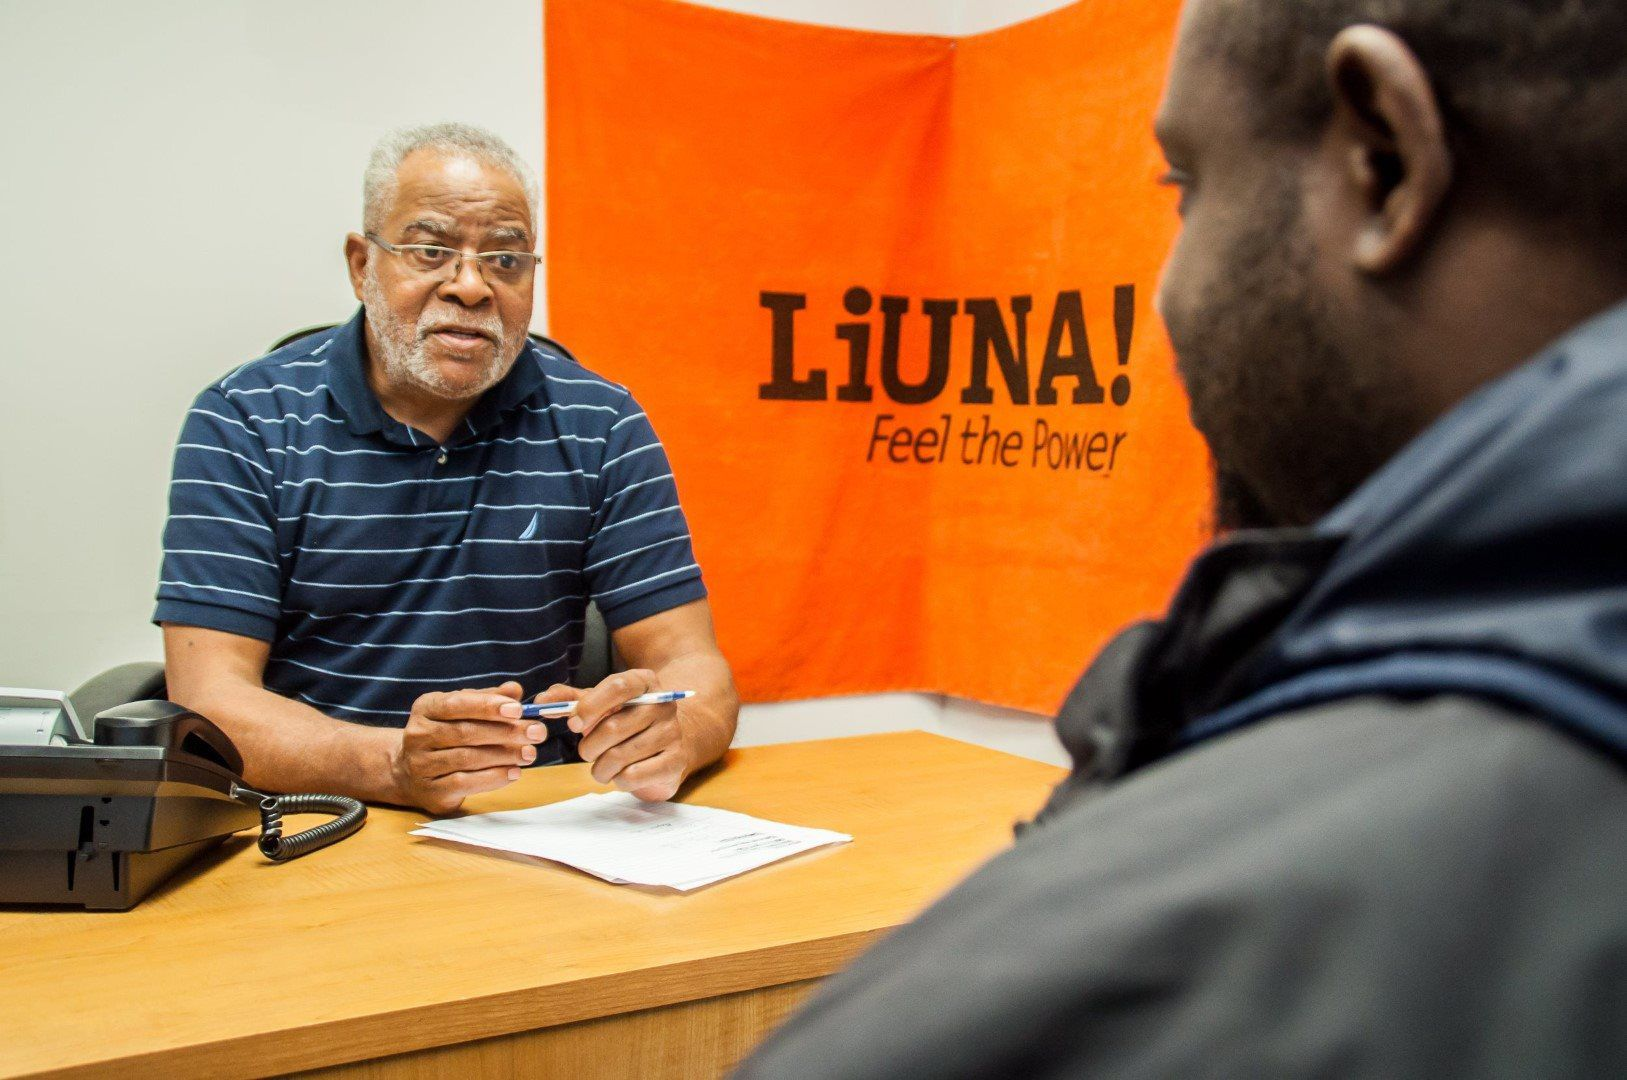 LIUNA Public Service Employees